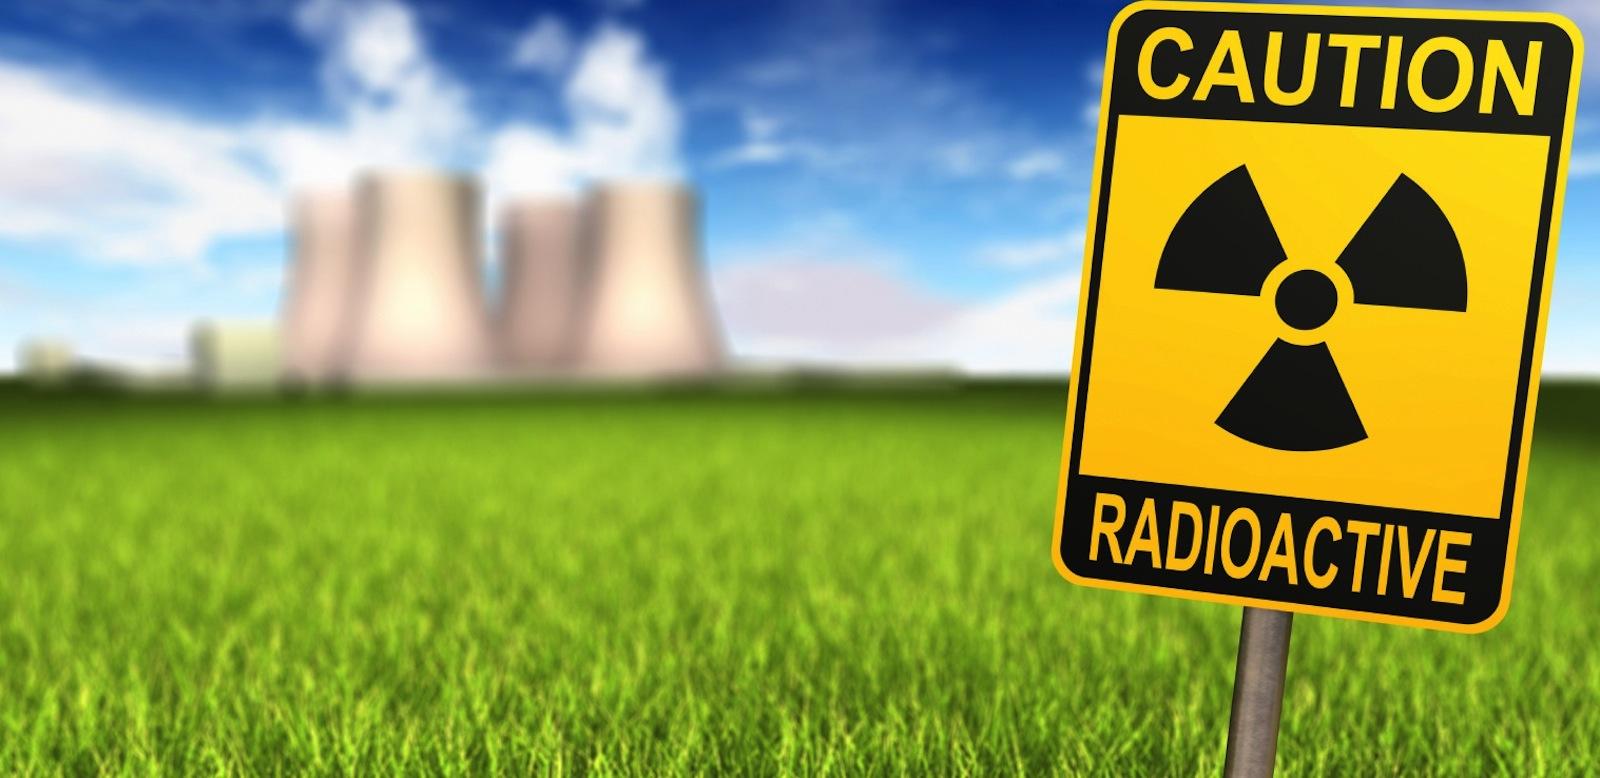 Radiation Backgrounds, Compatible - PC, Mobile, Gadgets  1600x778 px